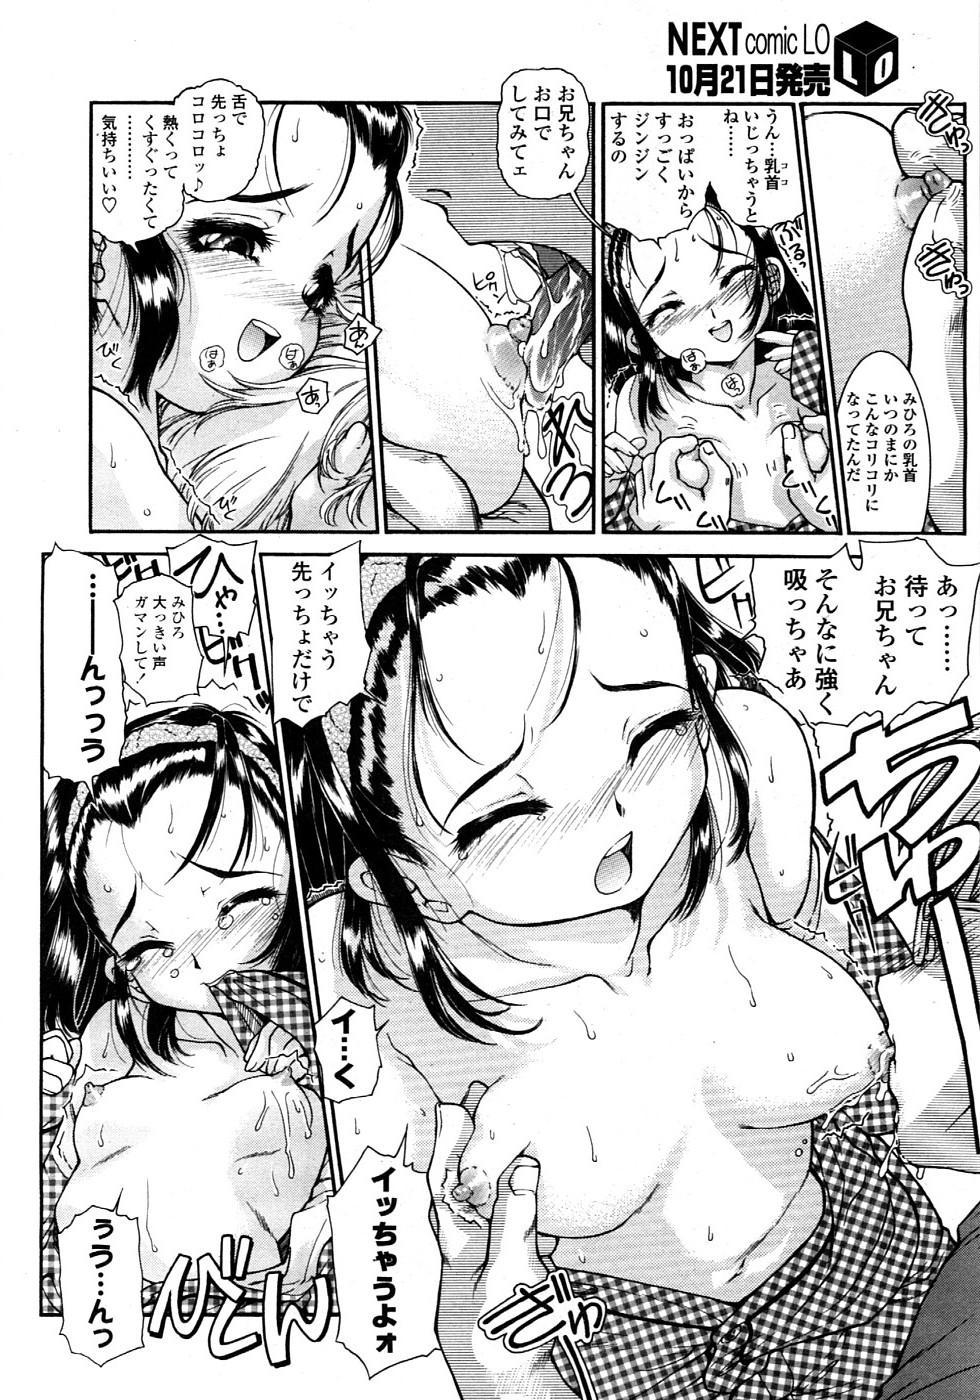 Comic LO 2008-11 Vol. 56 11